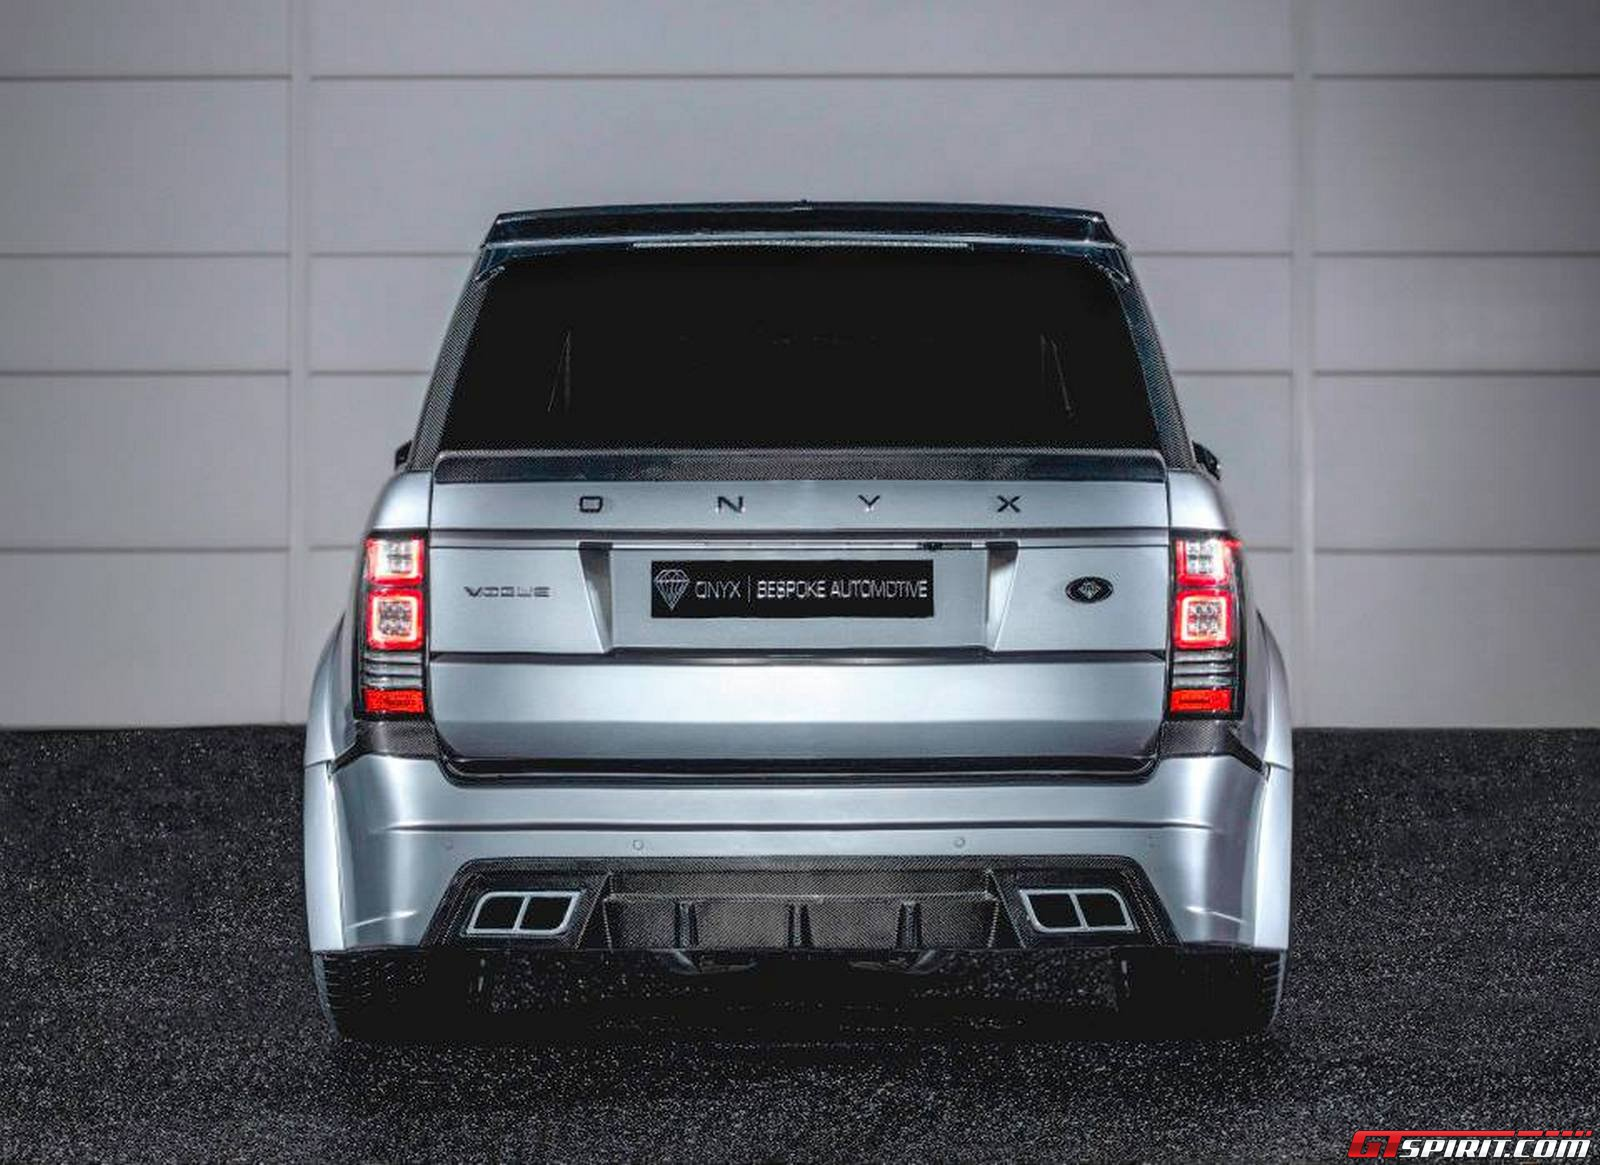 http://www.gtspirit.com/wp-content/gallery/range-rover-aspen-ultimate-series/range-rover-aspen-ultimate-series-3.jpg